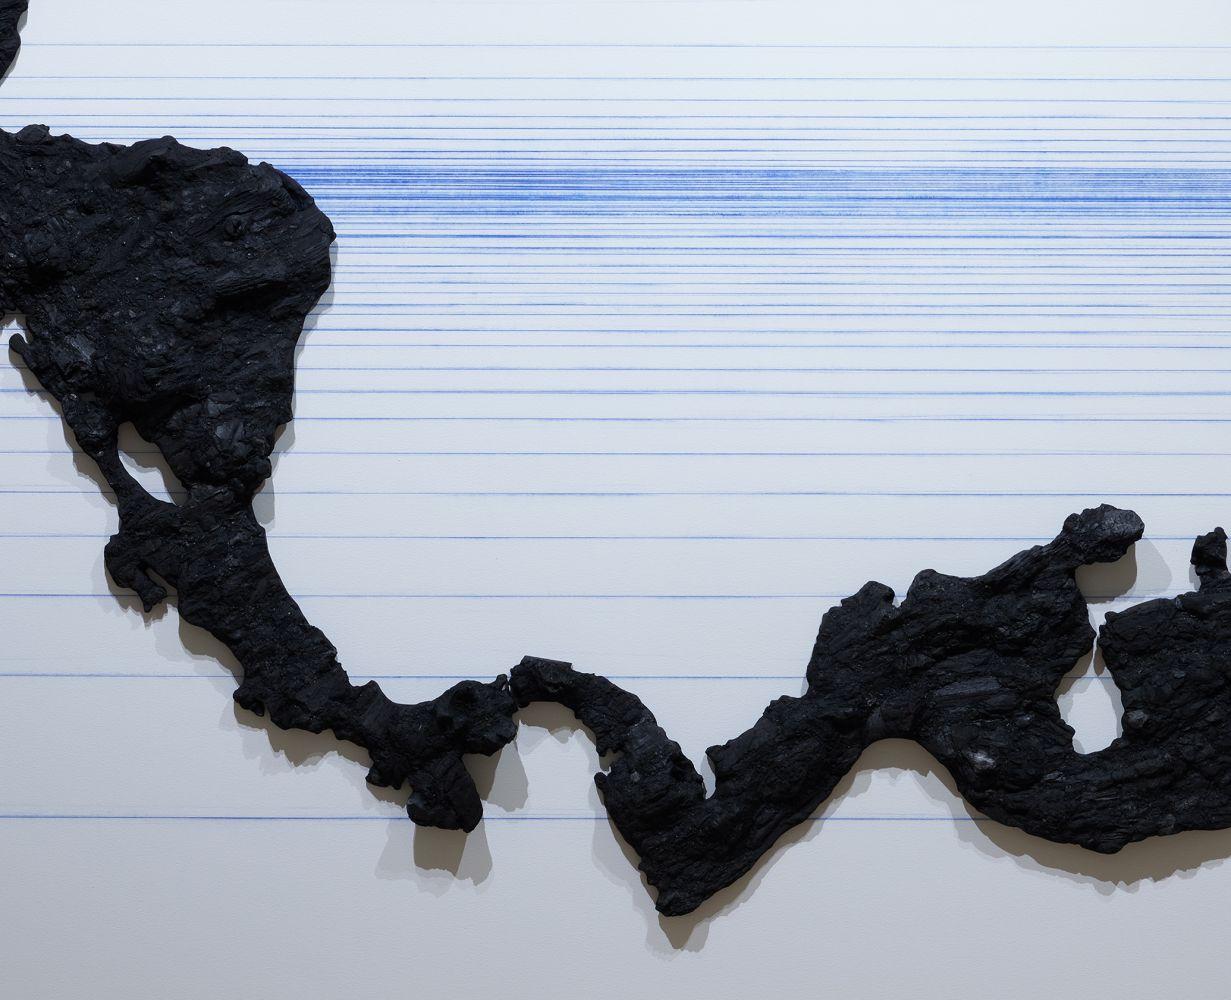 Teresita Fernández, Archipelago(Cervix), Installation view, detail